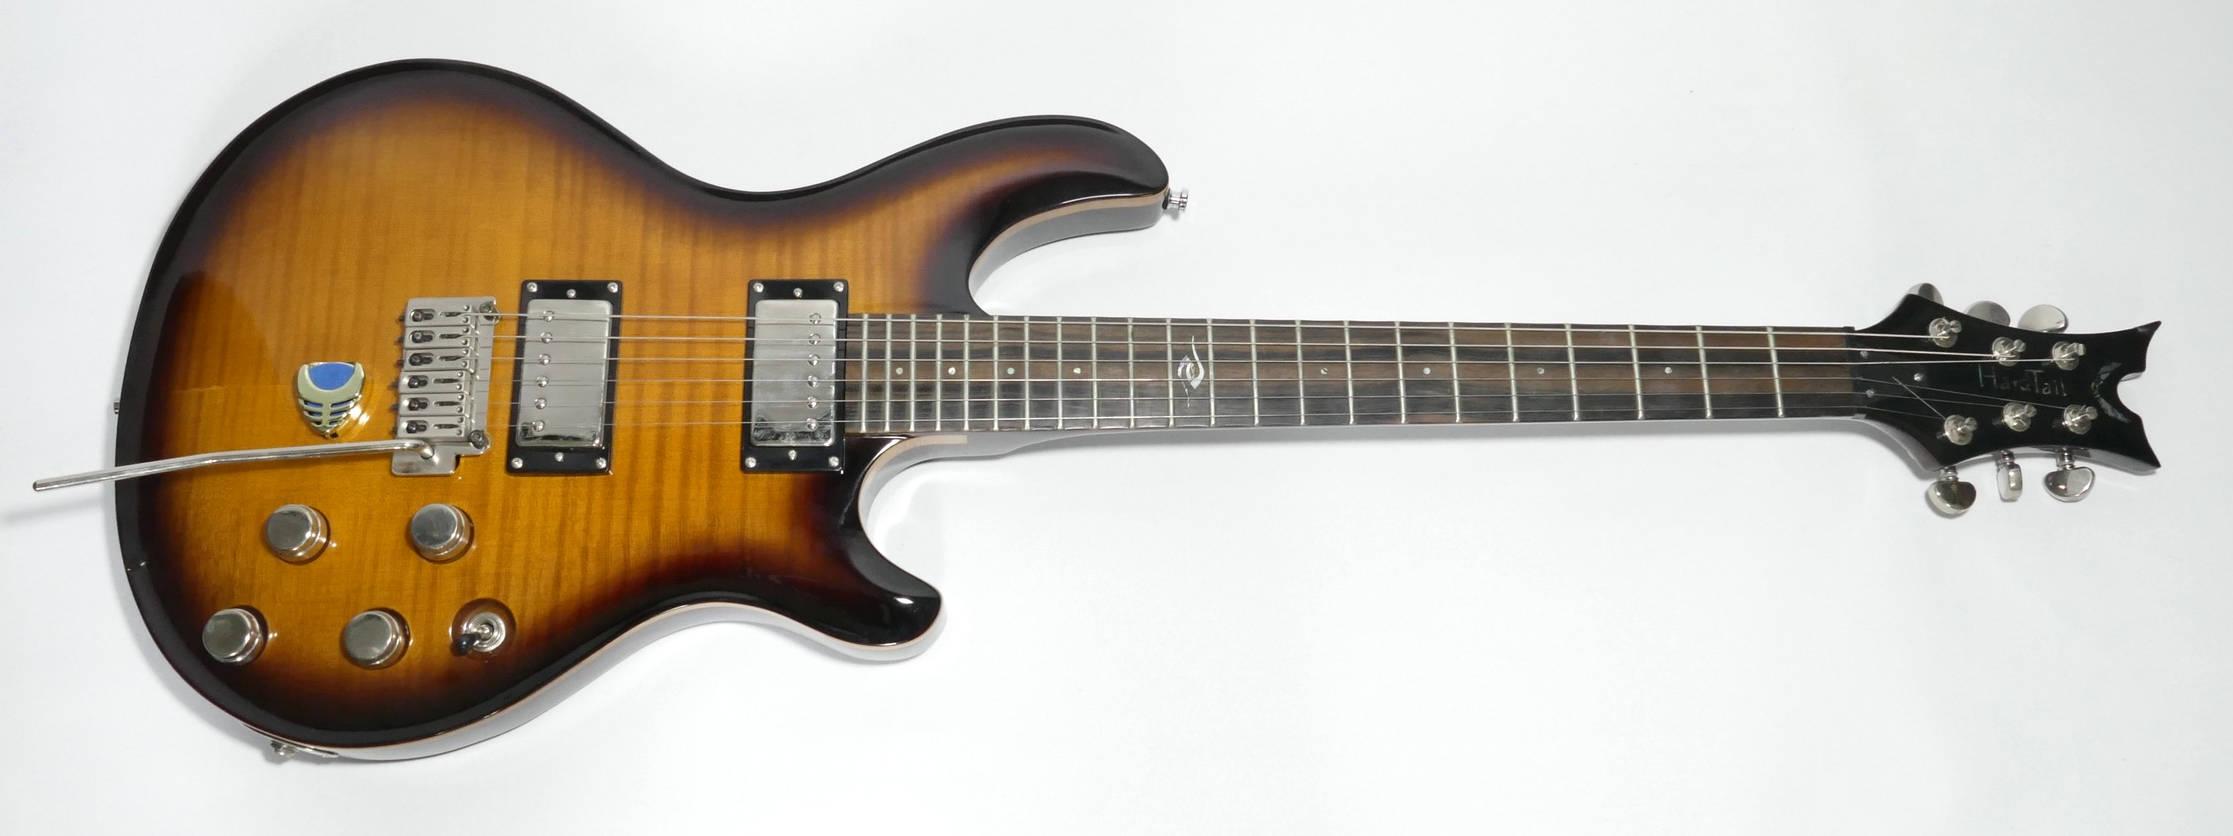 E-Gitarre DEAN Hardtail